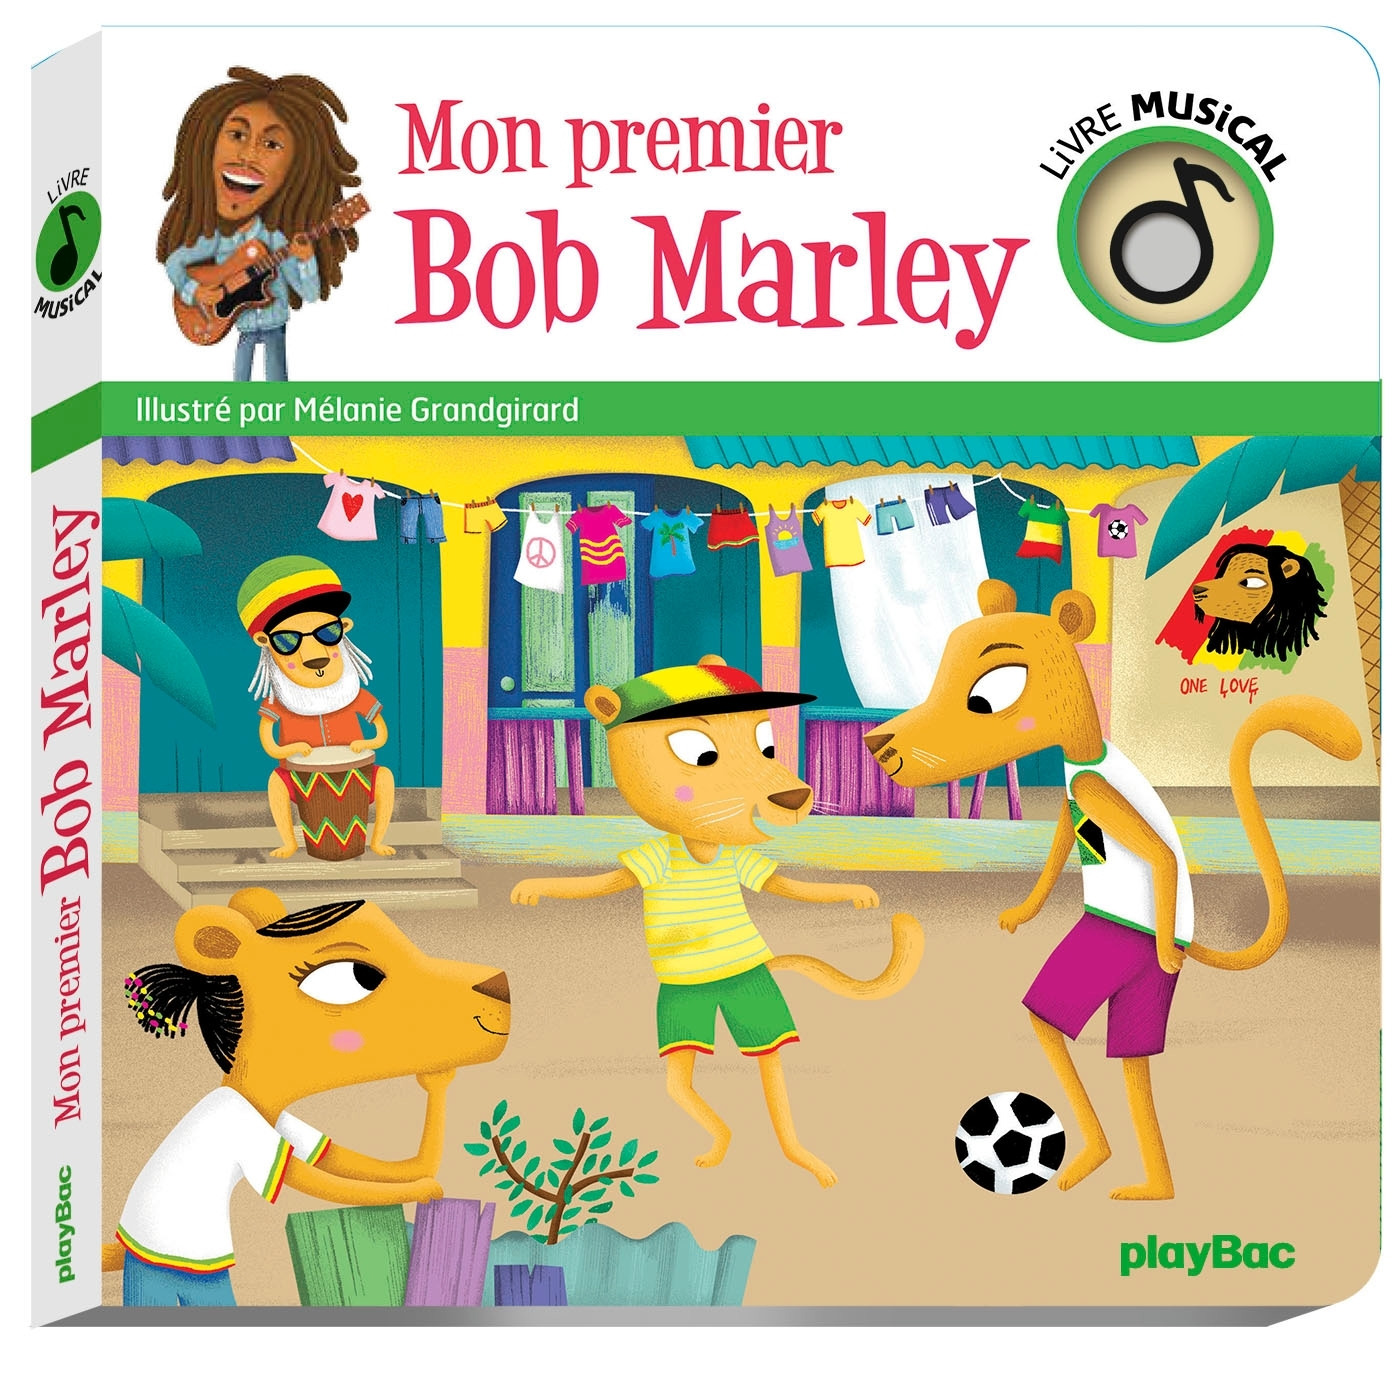 LIVRE MUSICAL - MON PREMIER BOB MARLEY